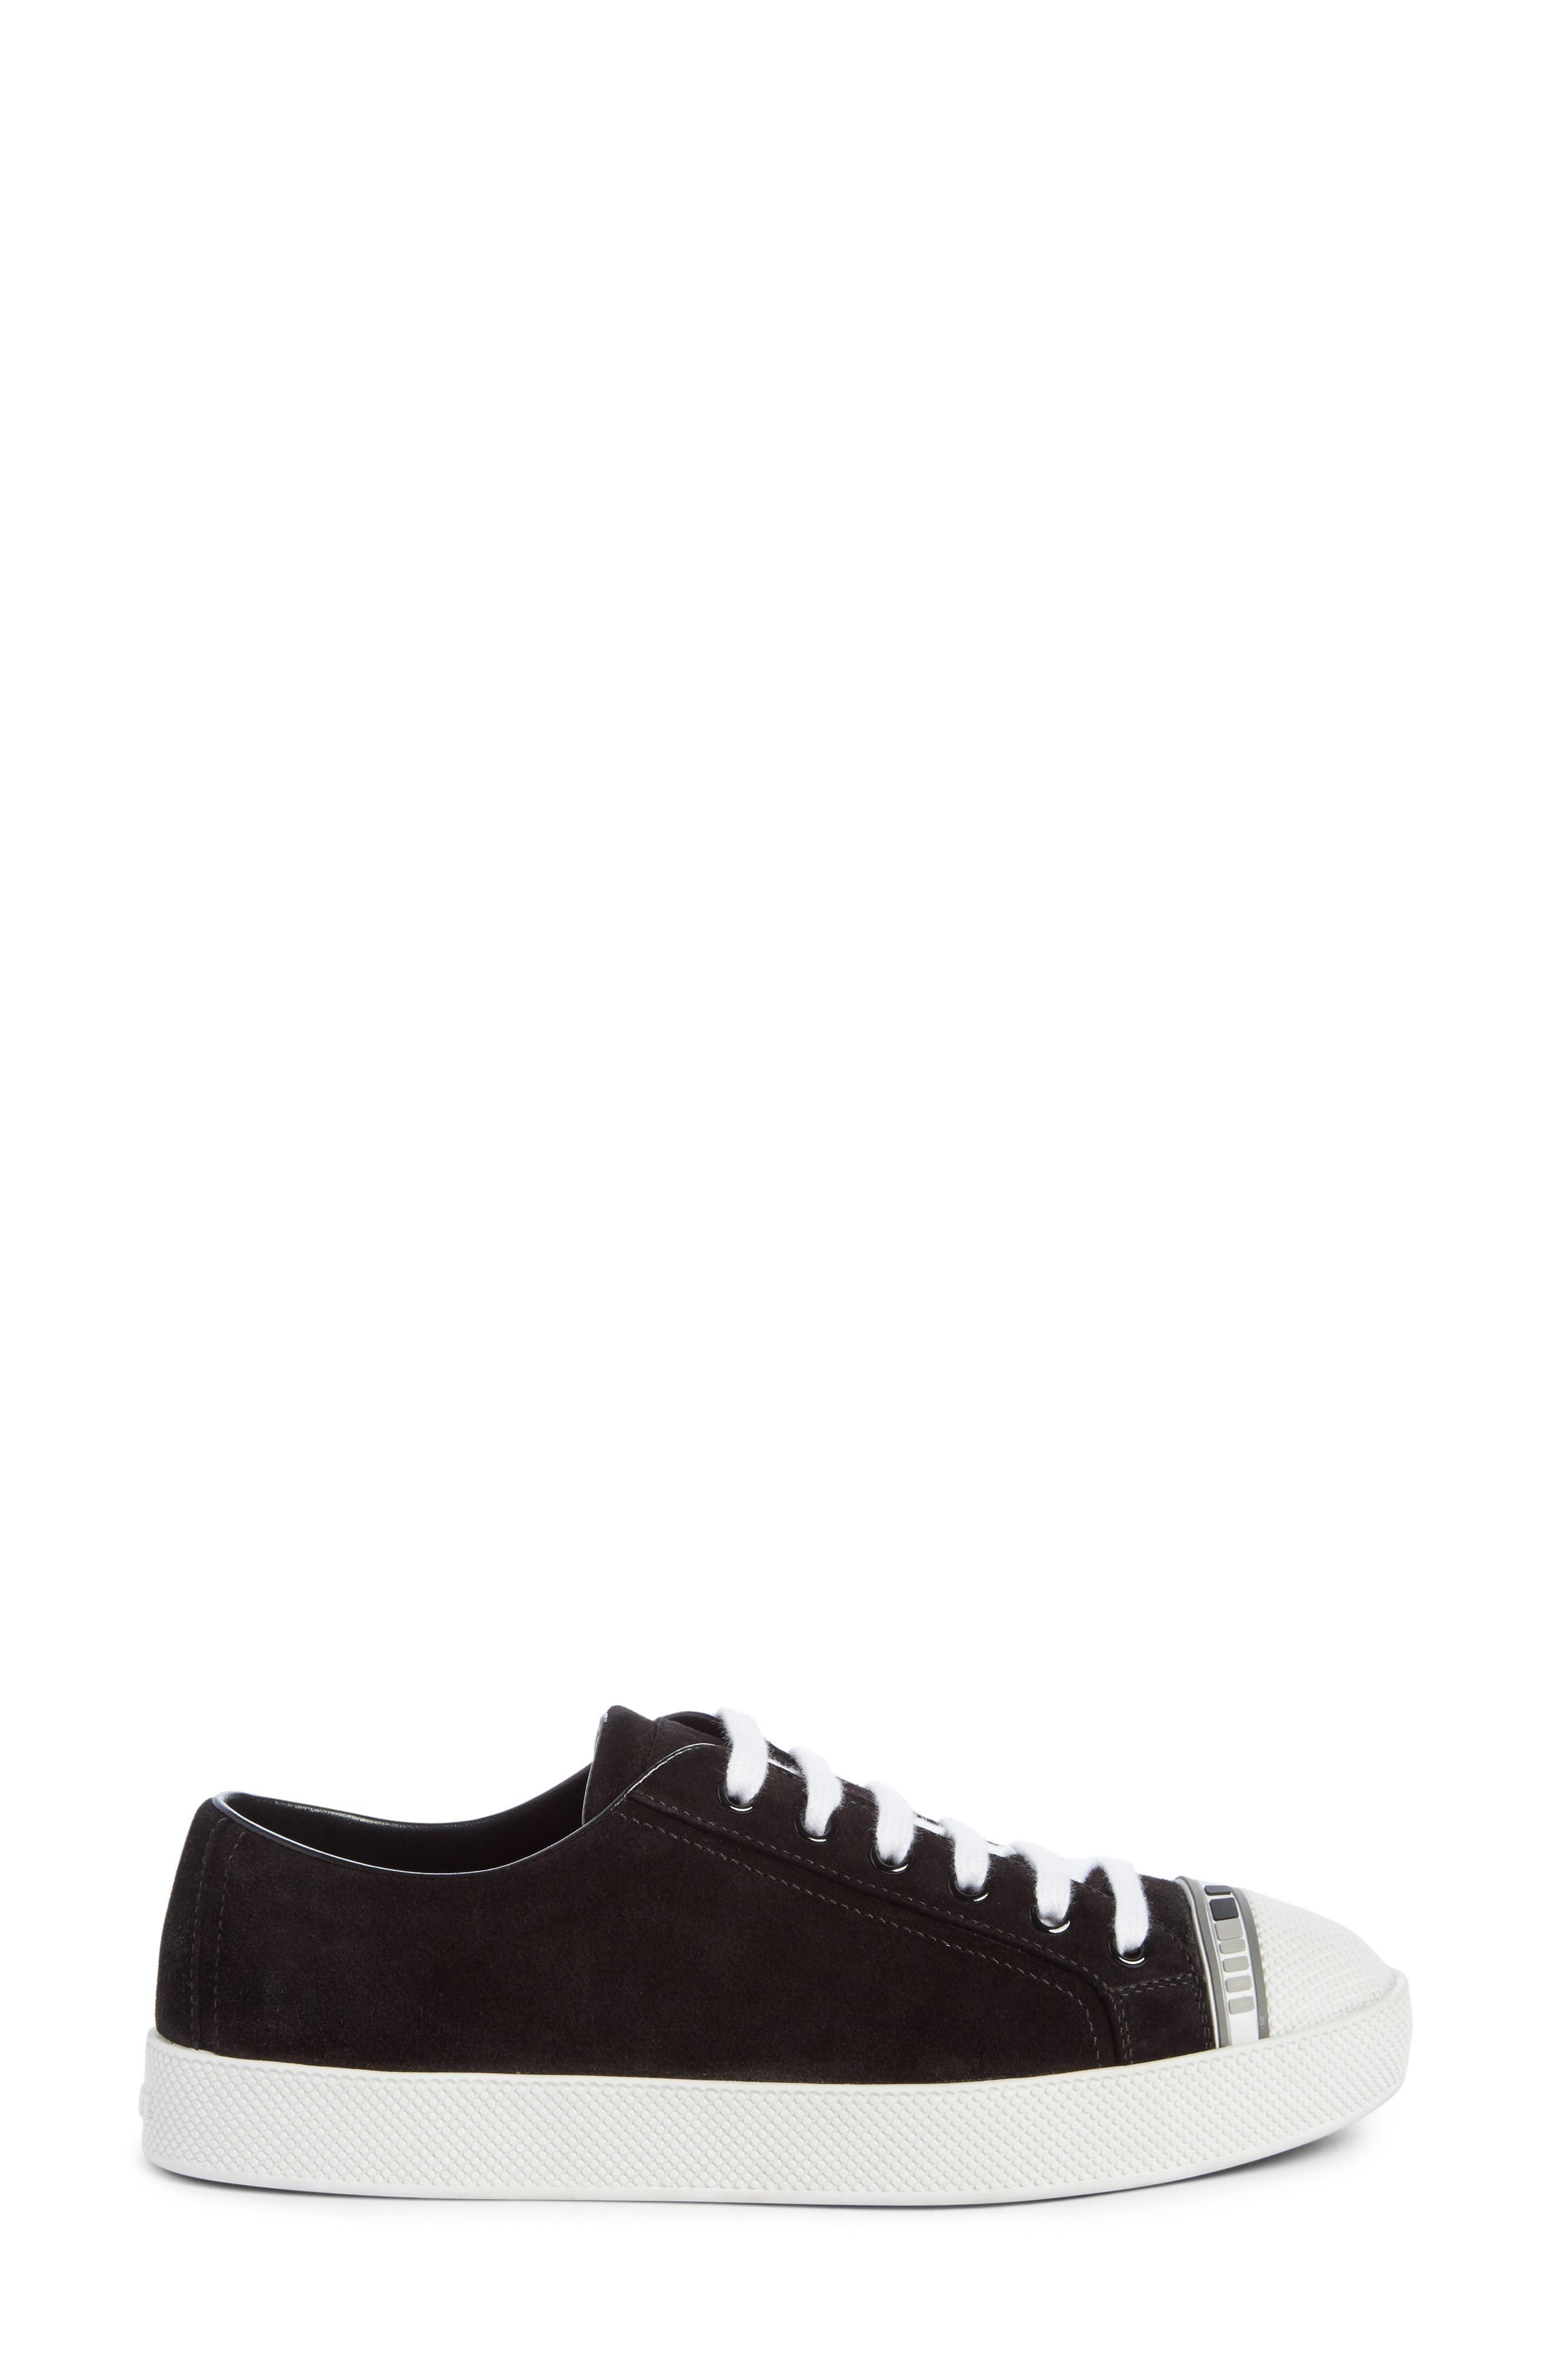 Linea Rossa Logo Platform Sneaker,                             Alternate thumbnail 3, color,                             001